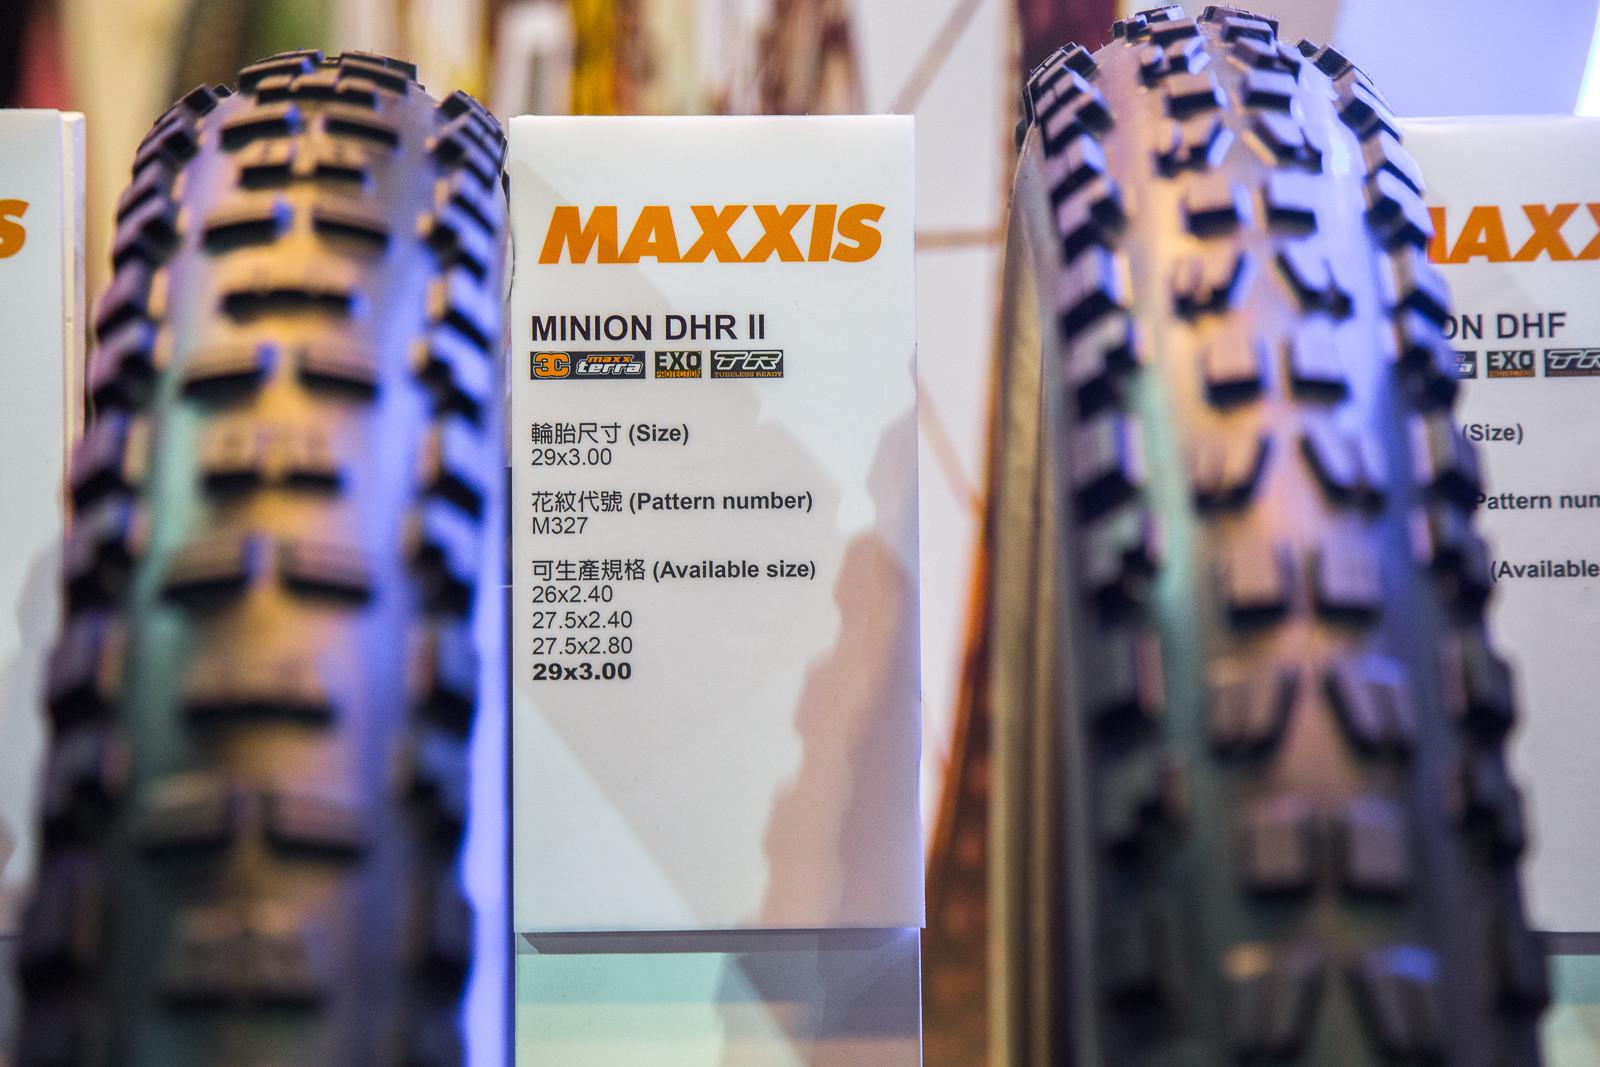 New Maxxis Tire Options at Taipei Cycle Show - 2016 Taipei Bike Show - Mountain Biking Pictures - Vital MTB